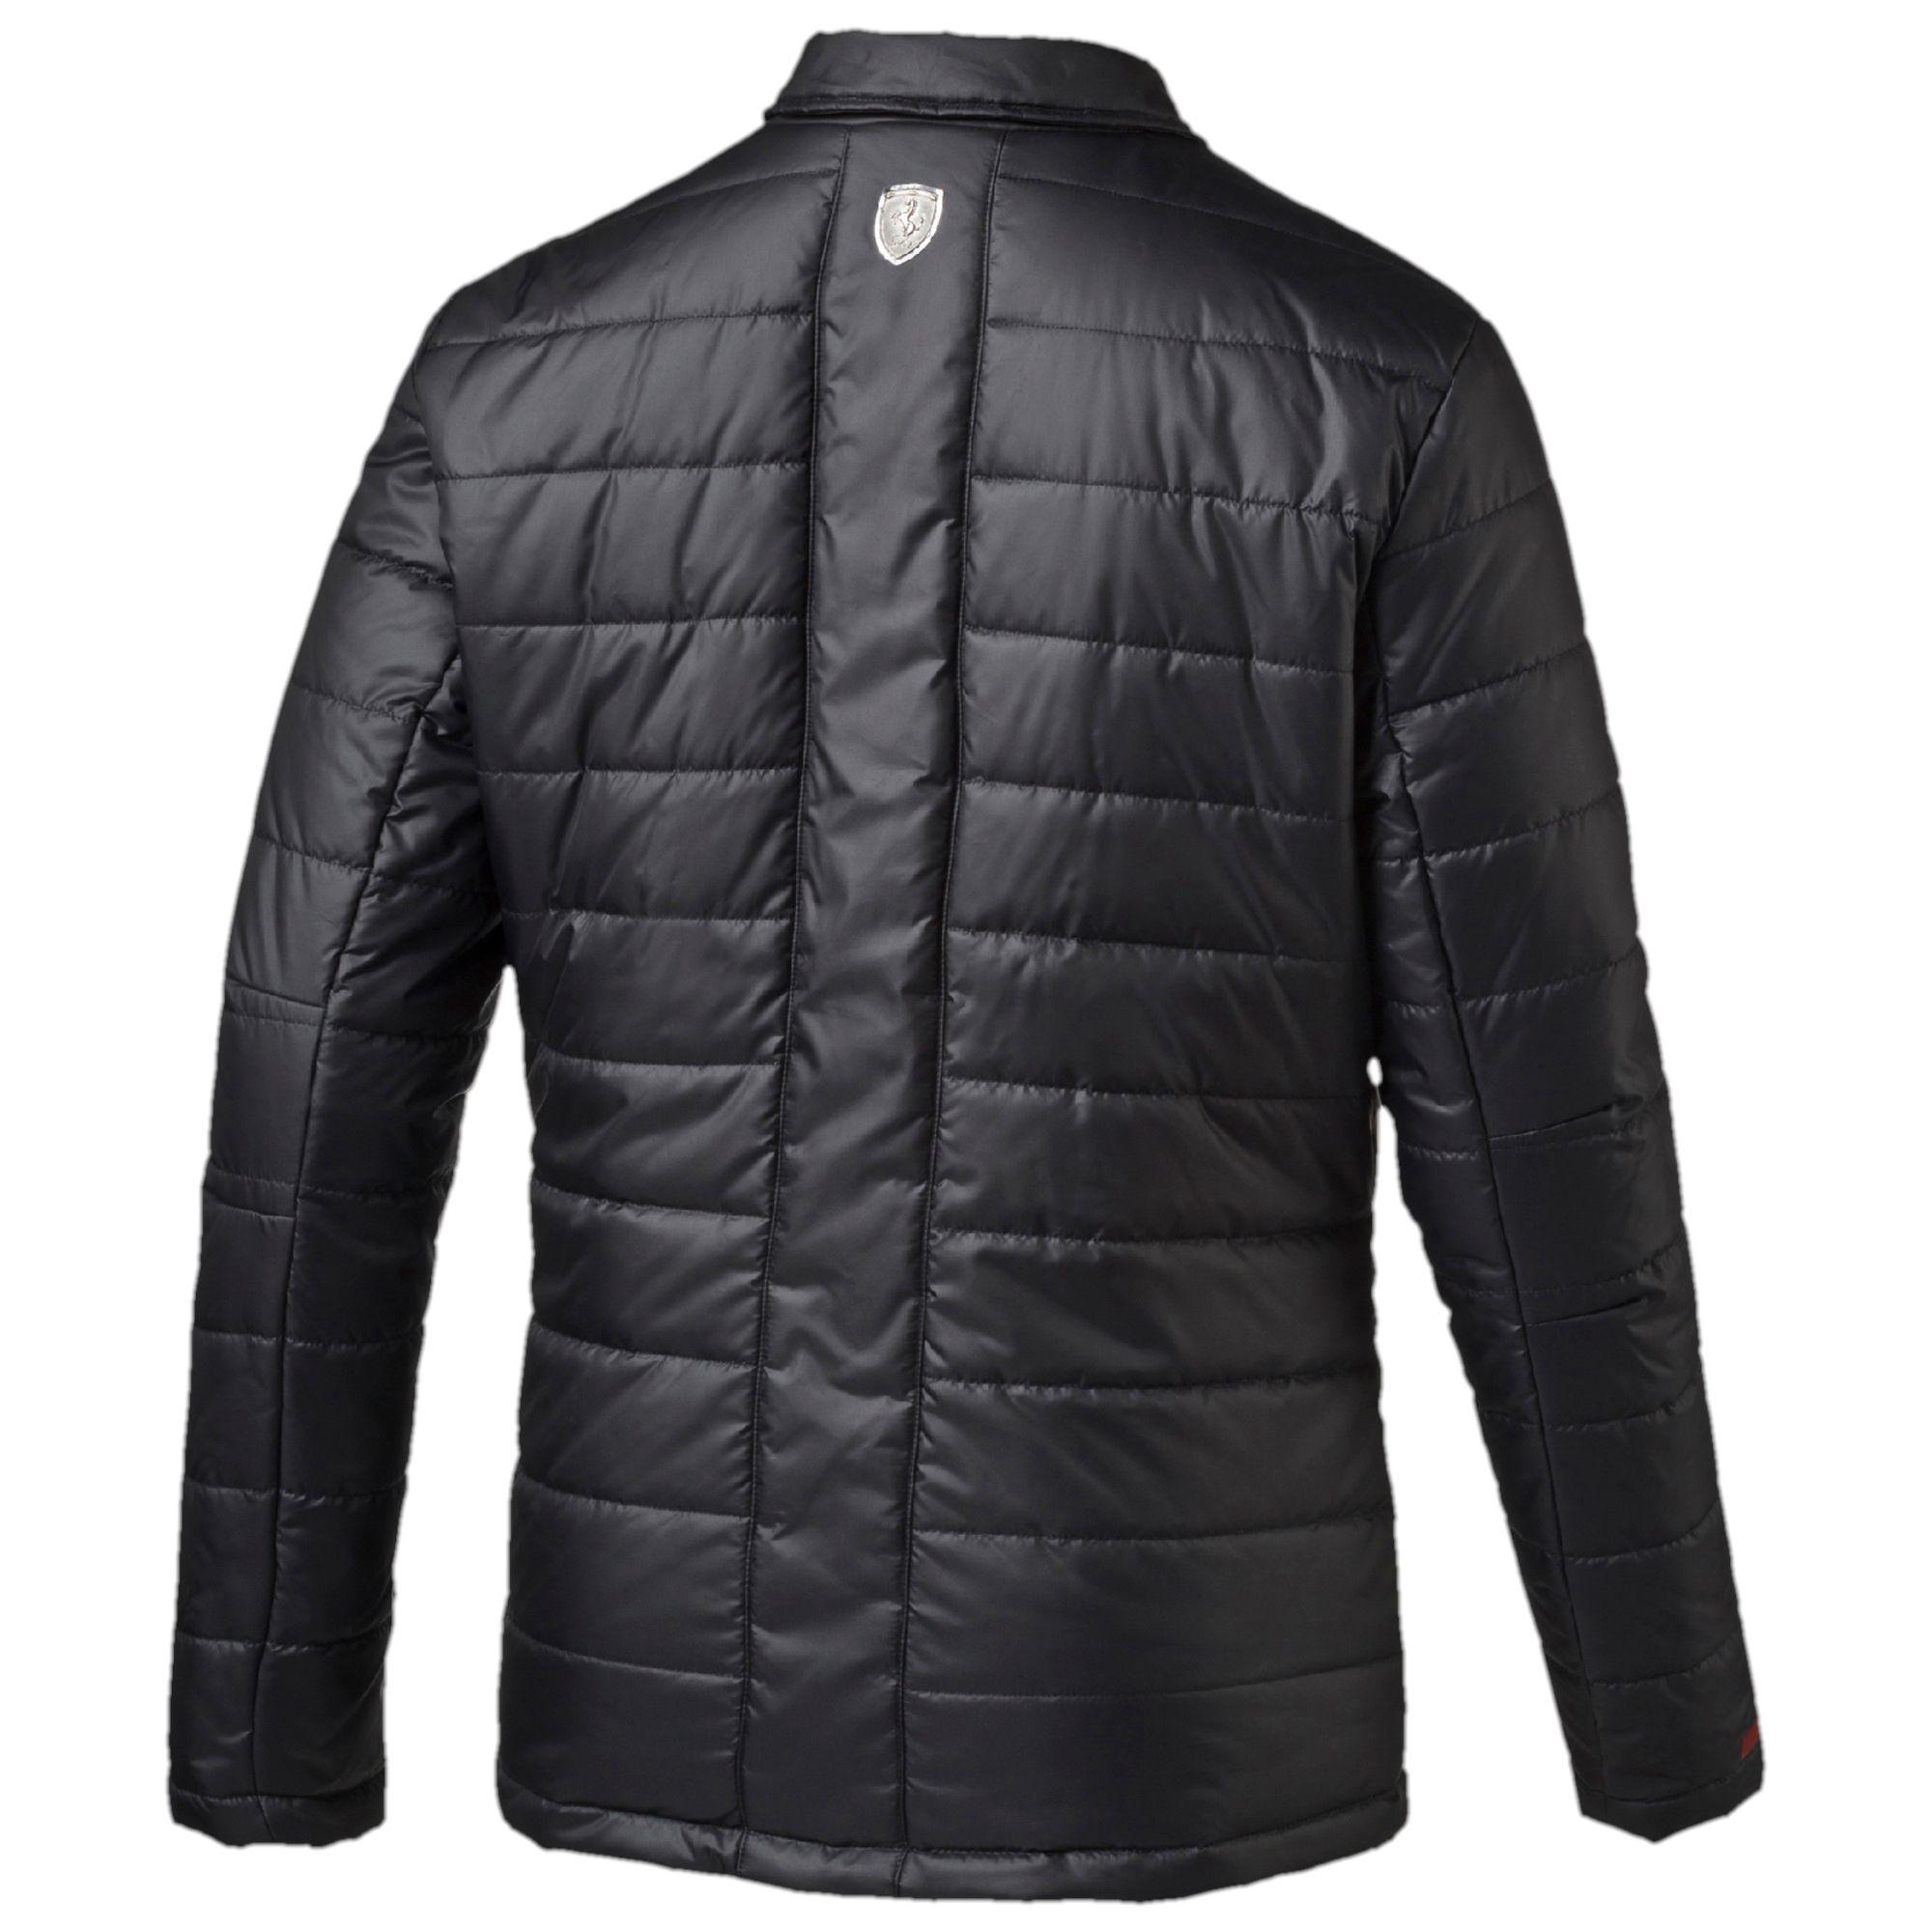 puma ferrari padded jacket apparel jackets auto men new | ebay